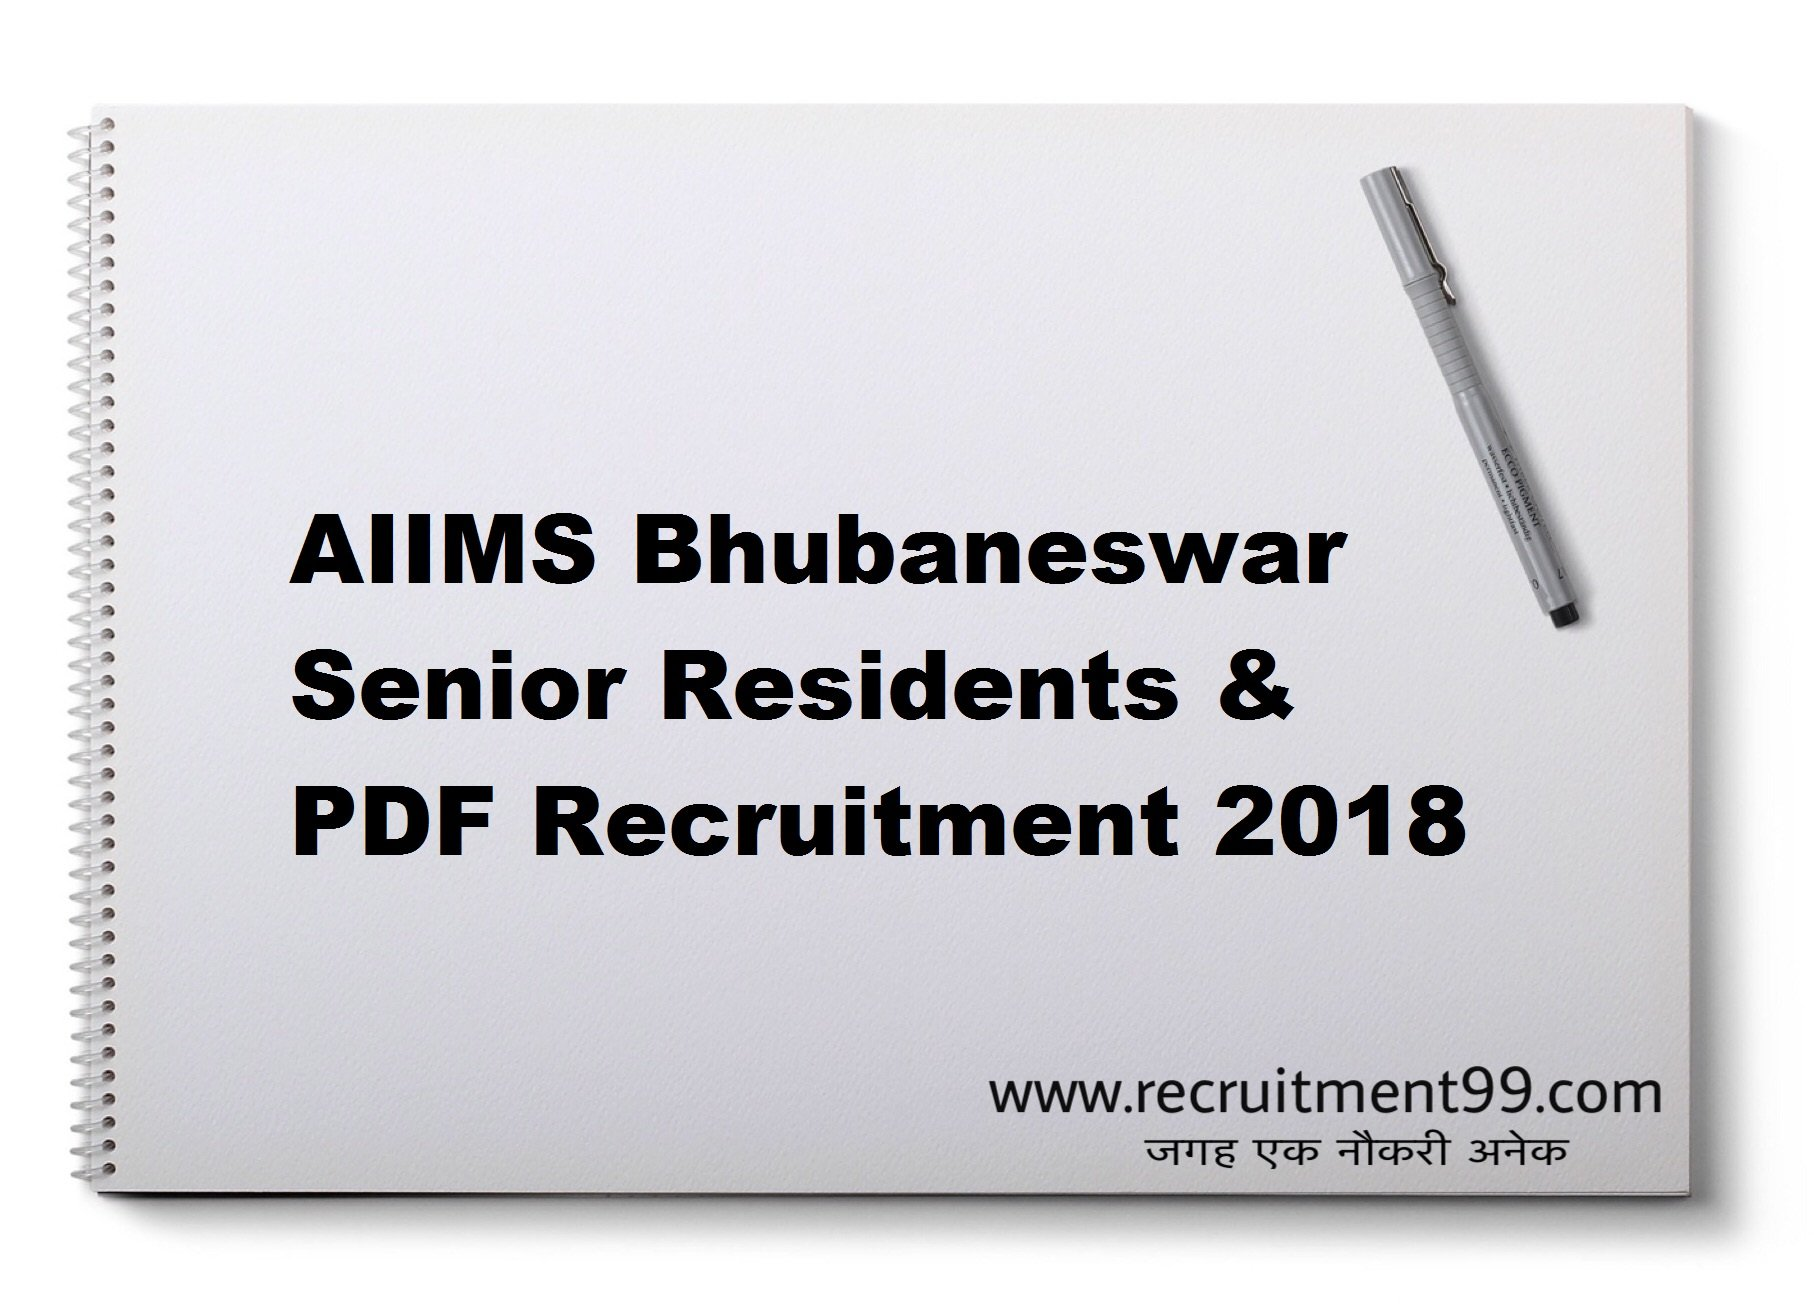 AIIMS Bhubaneswar Senior Residents& PDF Recruitment Admit Card & Result 2018